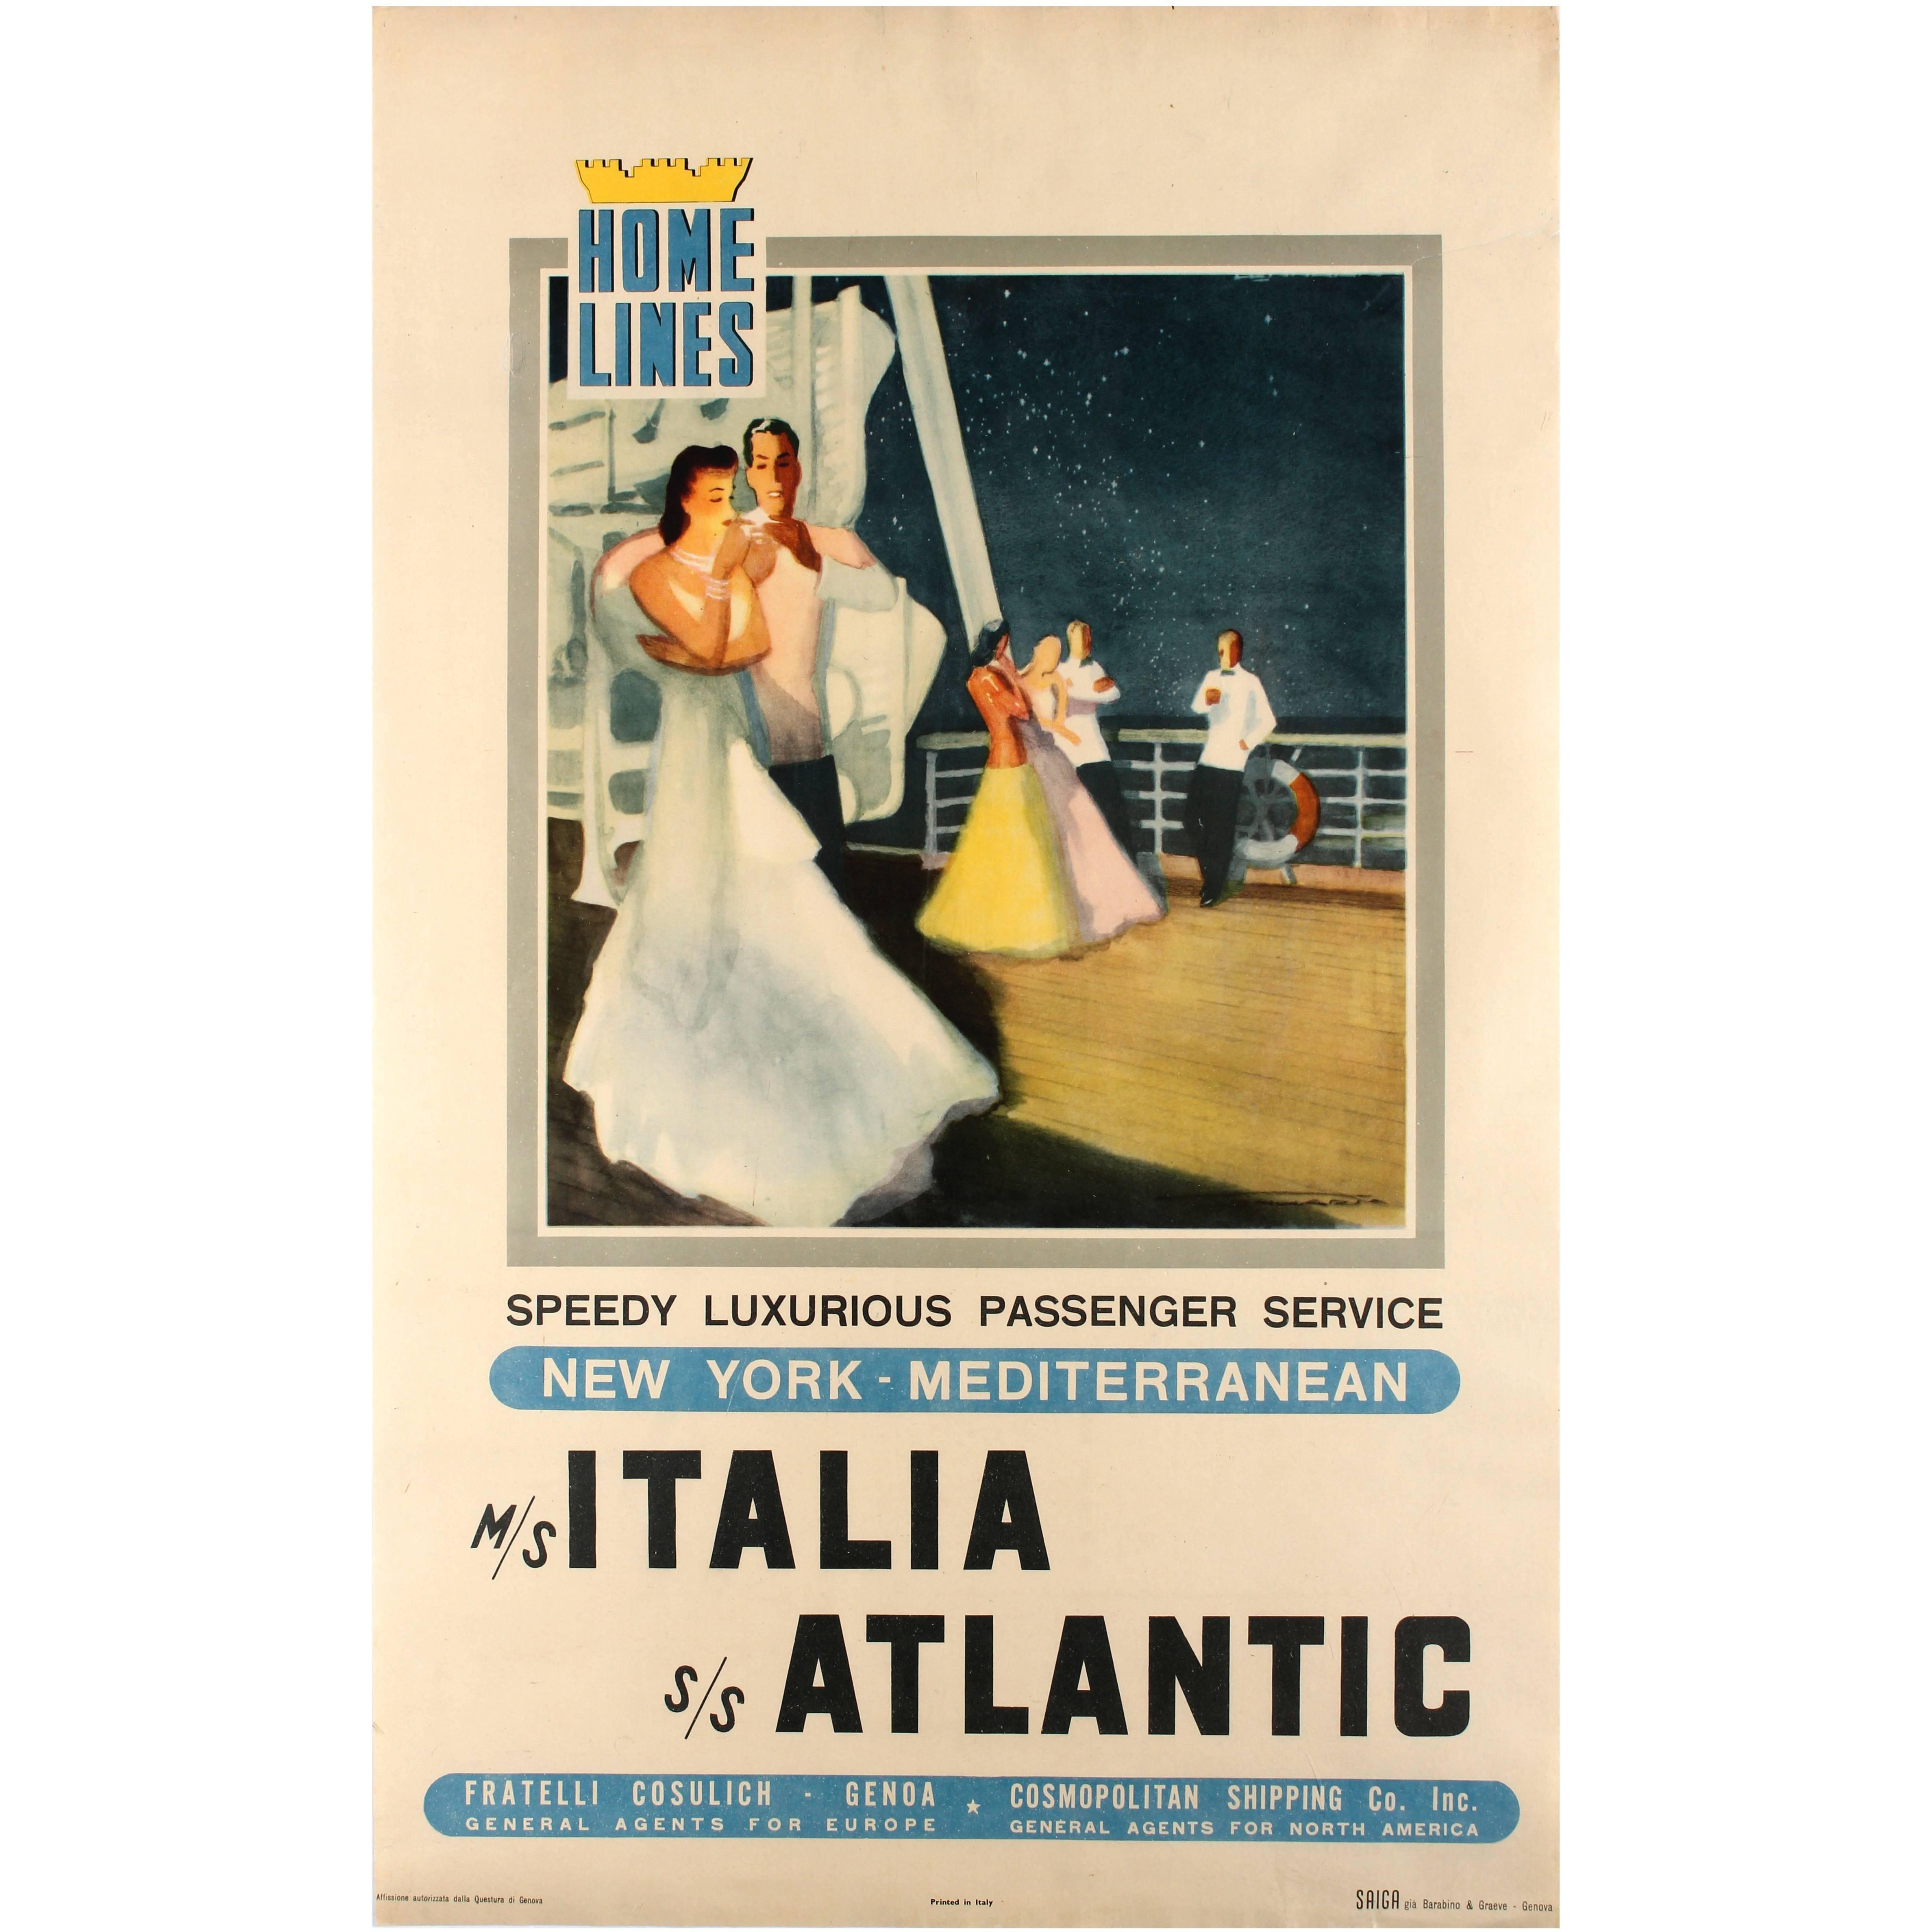 Original Vintage Home Lines Cruise Ship Service Poster New York